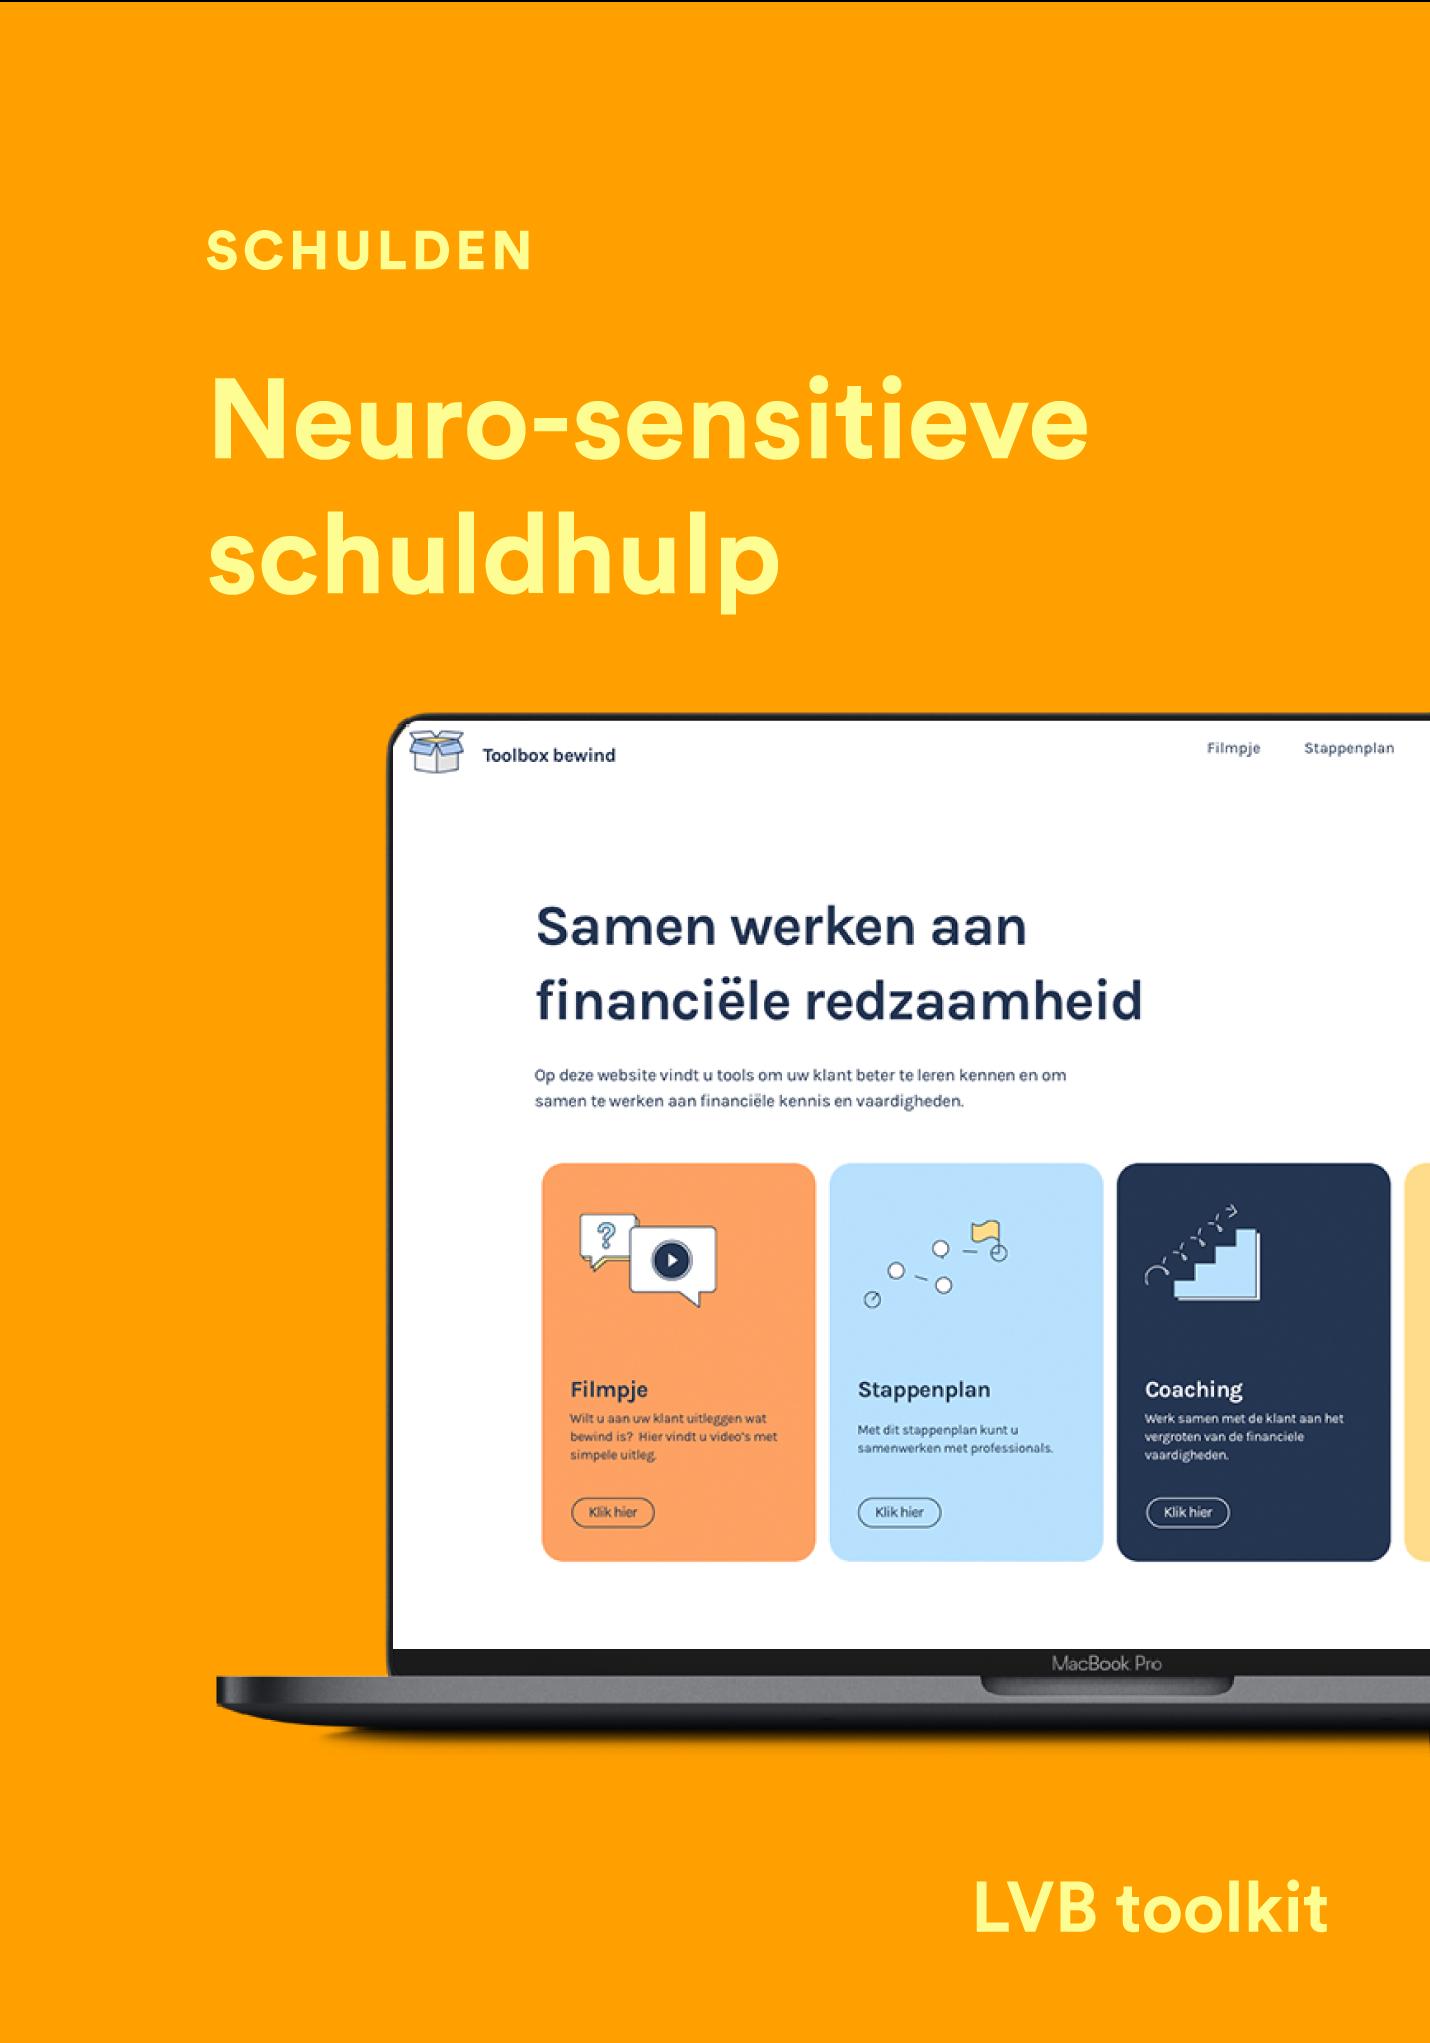 Project - LVB toolkit/HVA - Neuro-sensitieve schuldhulp